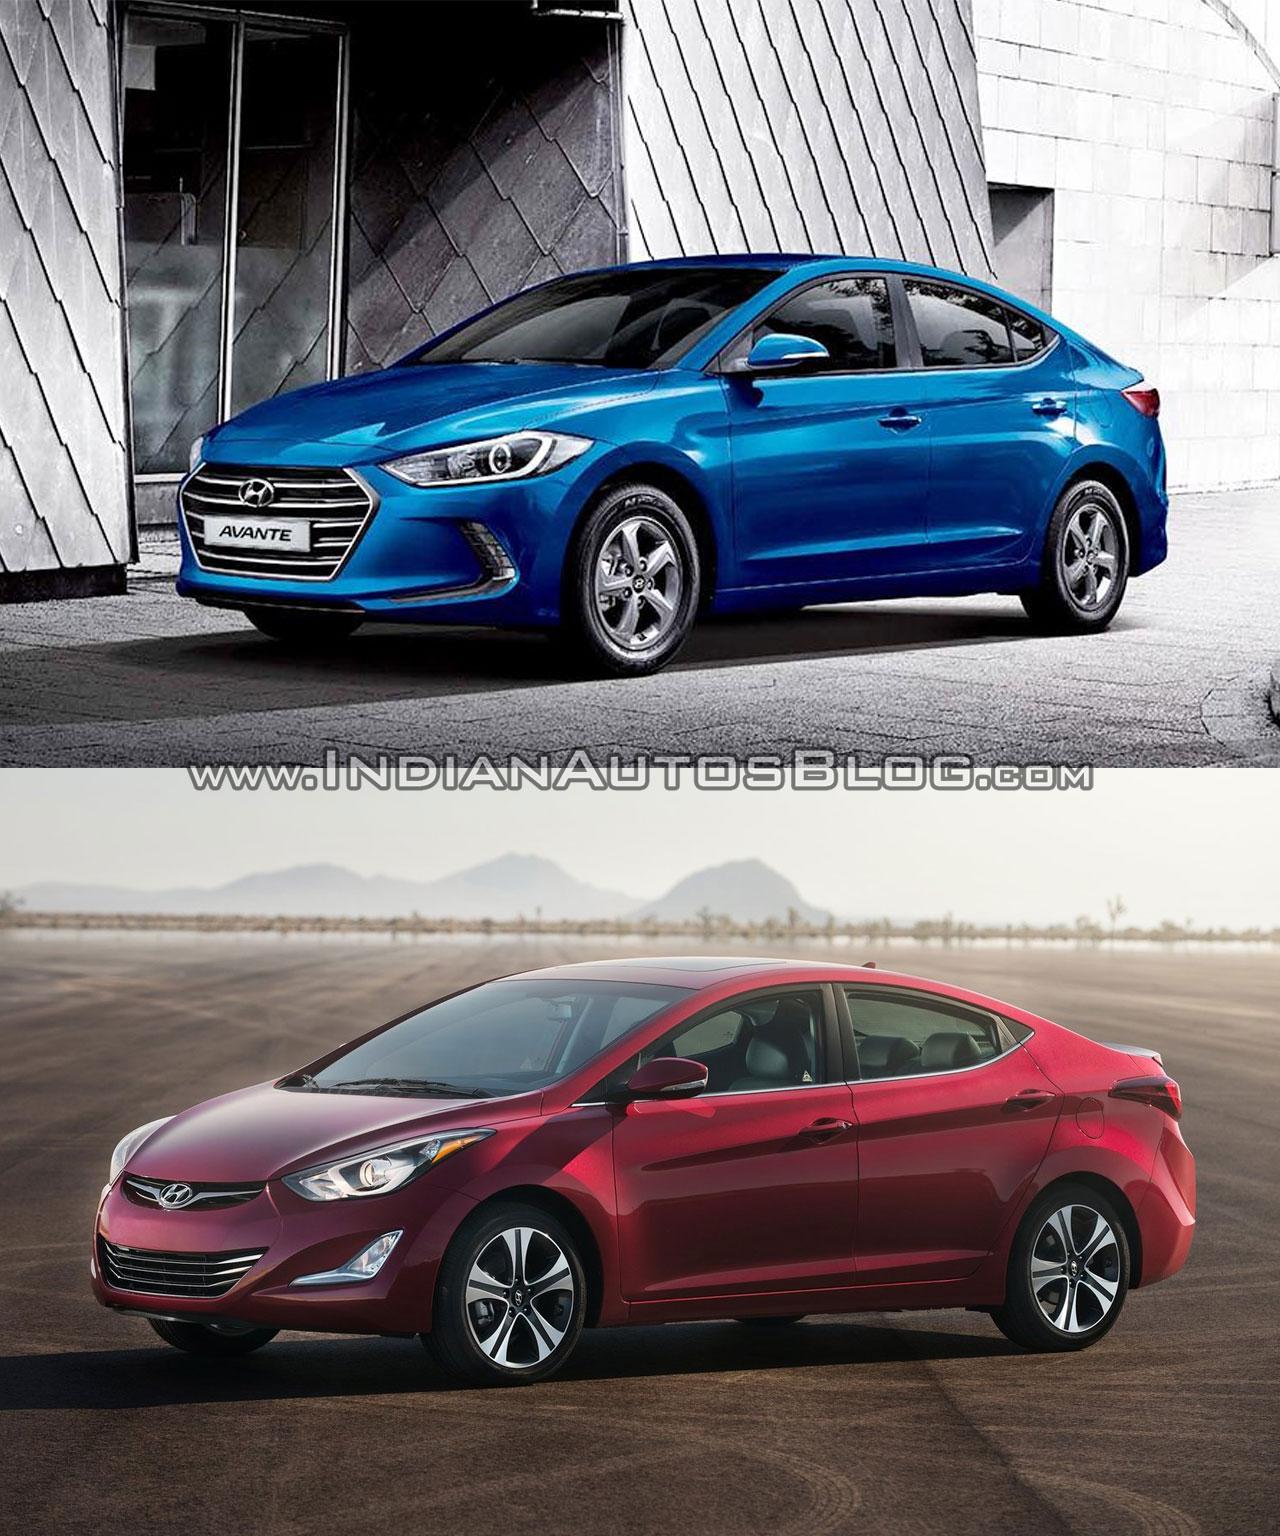 2016 Hyundai Elantra vs older model side